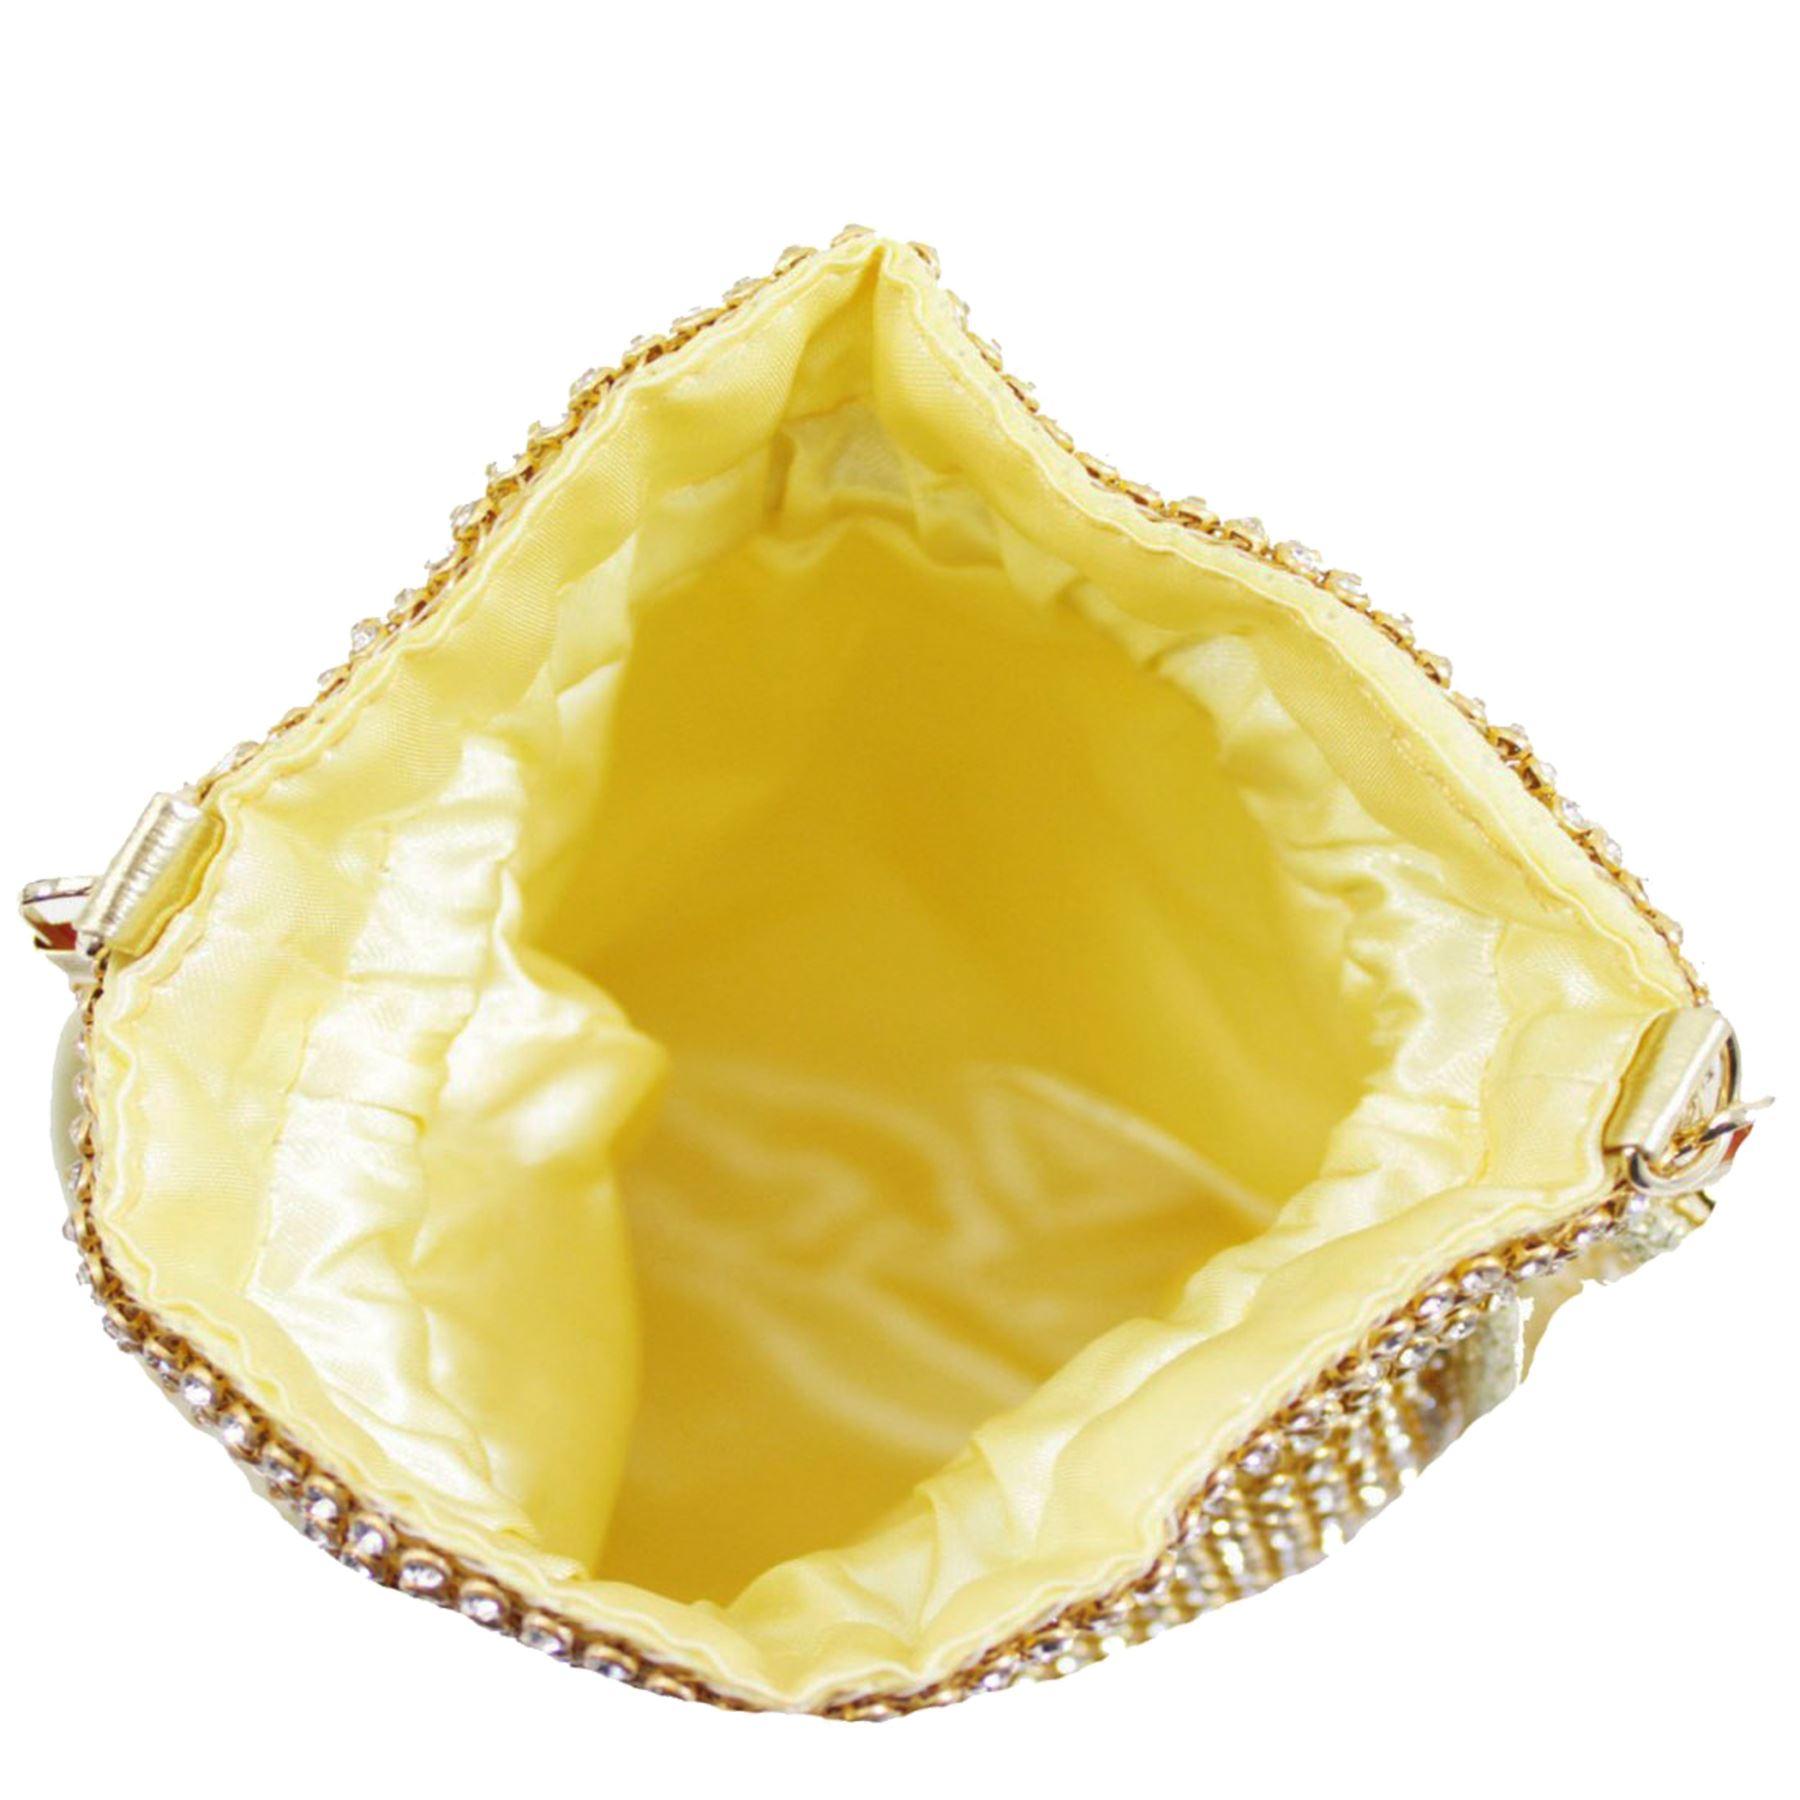 New-Ladies-Rhinestone-Diamante-Drawstring-Chain-Strap-Pouch-Bag thumbnail 5